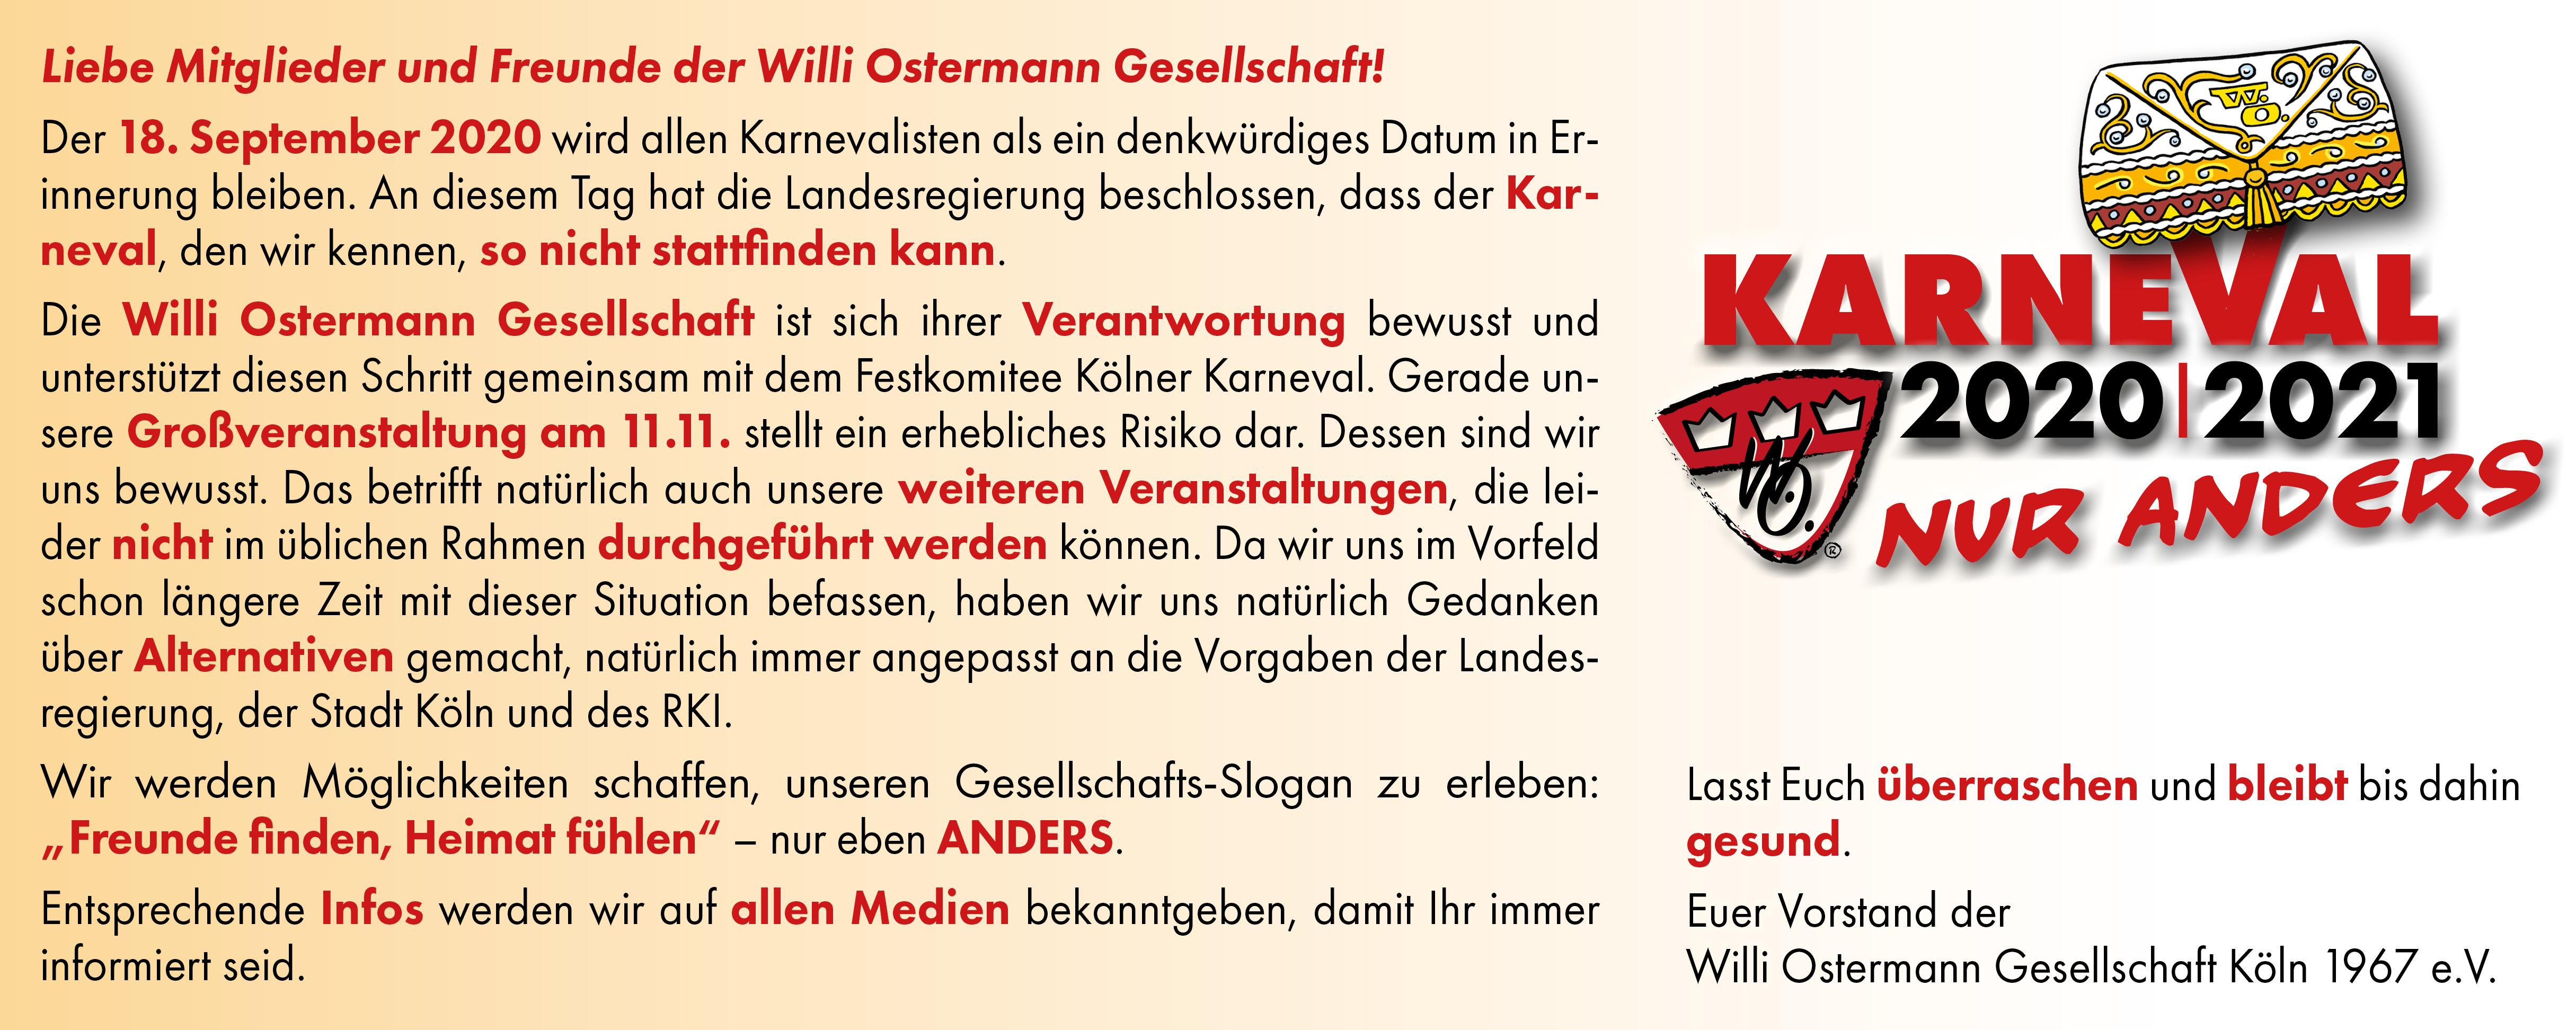 Sartory Köln Karneval 2021